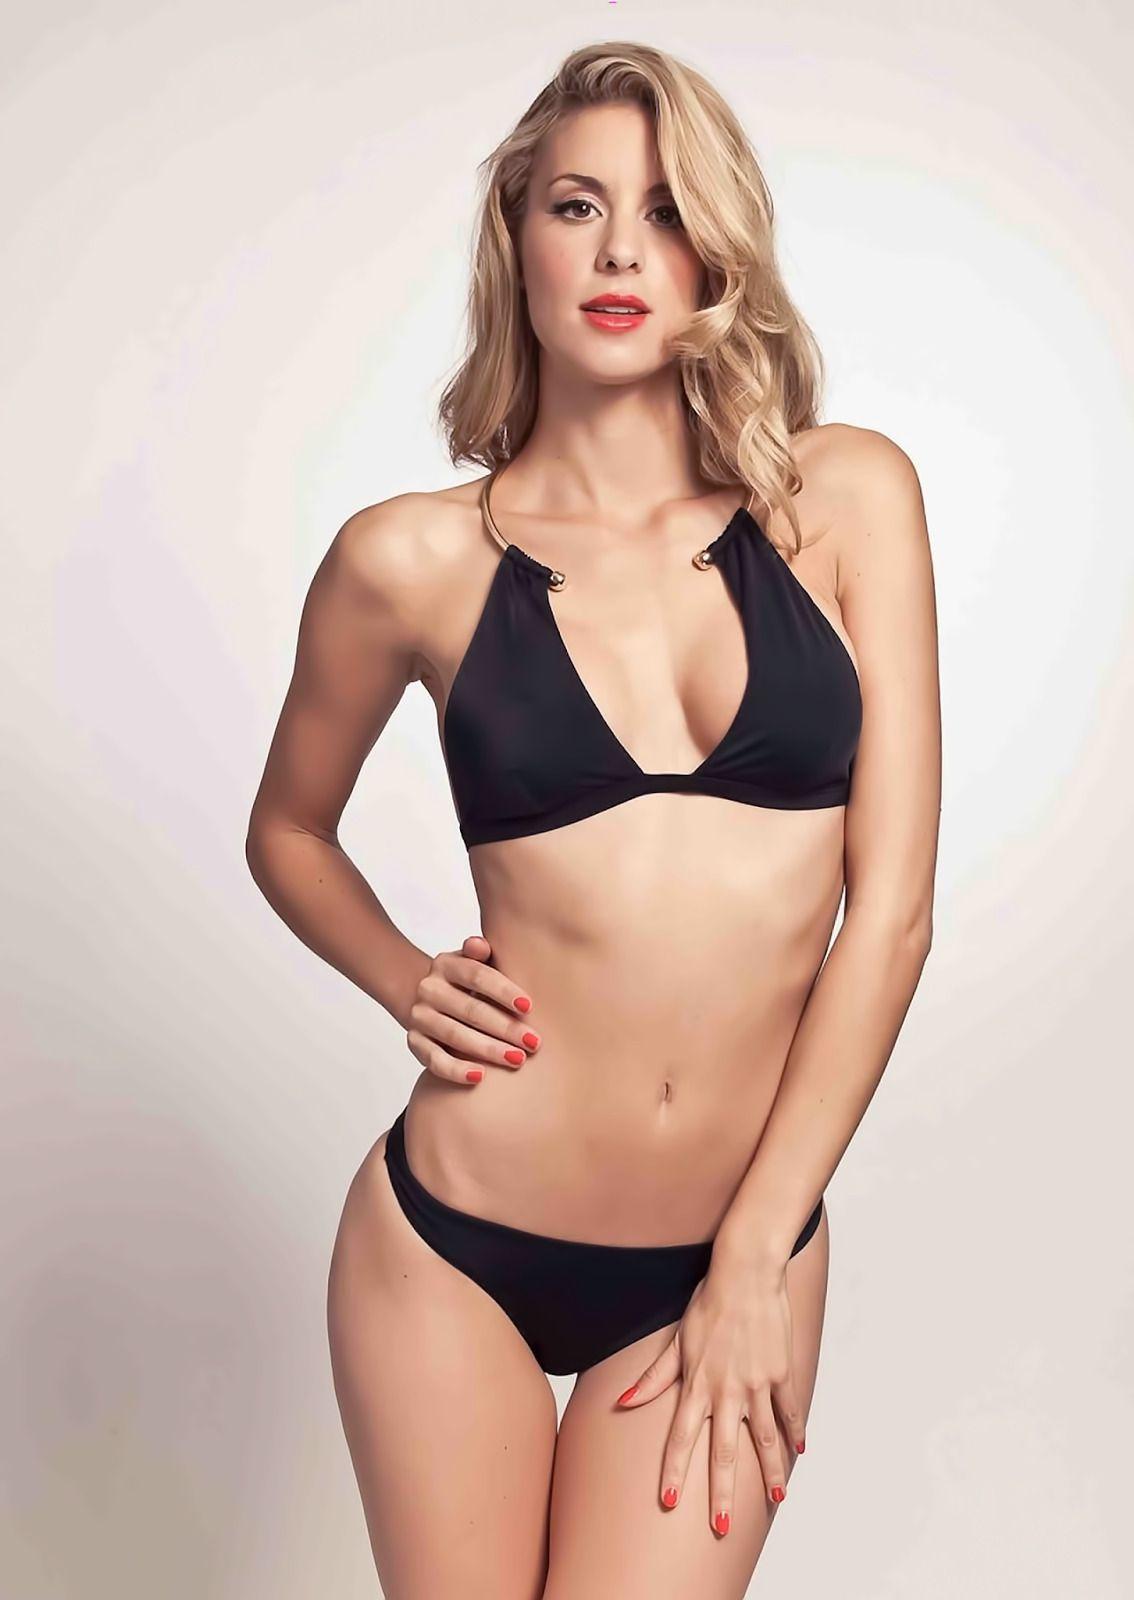 Bikini Ilena Ingwersen naked (14 photo), Sexy, Cleavage, Boobs, cleavage 2019